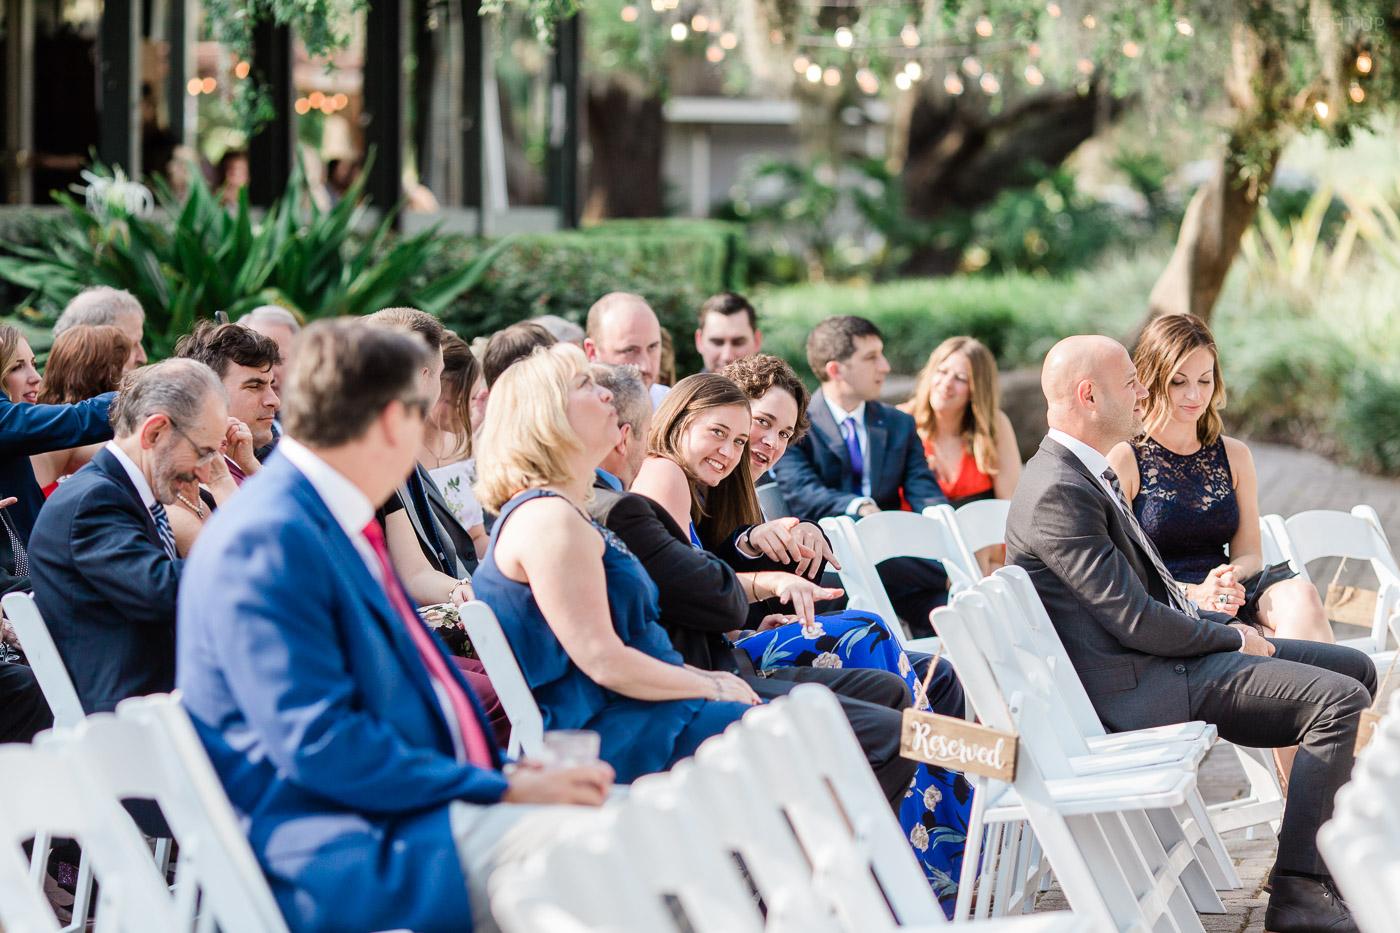 hstoric-dubsdread-wedding-orlando-5.jpg